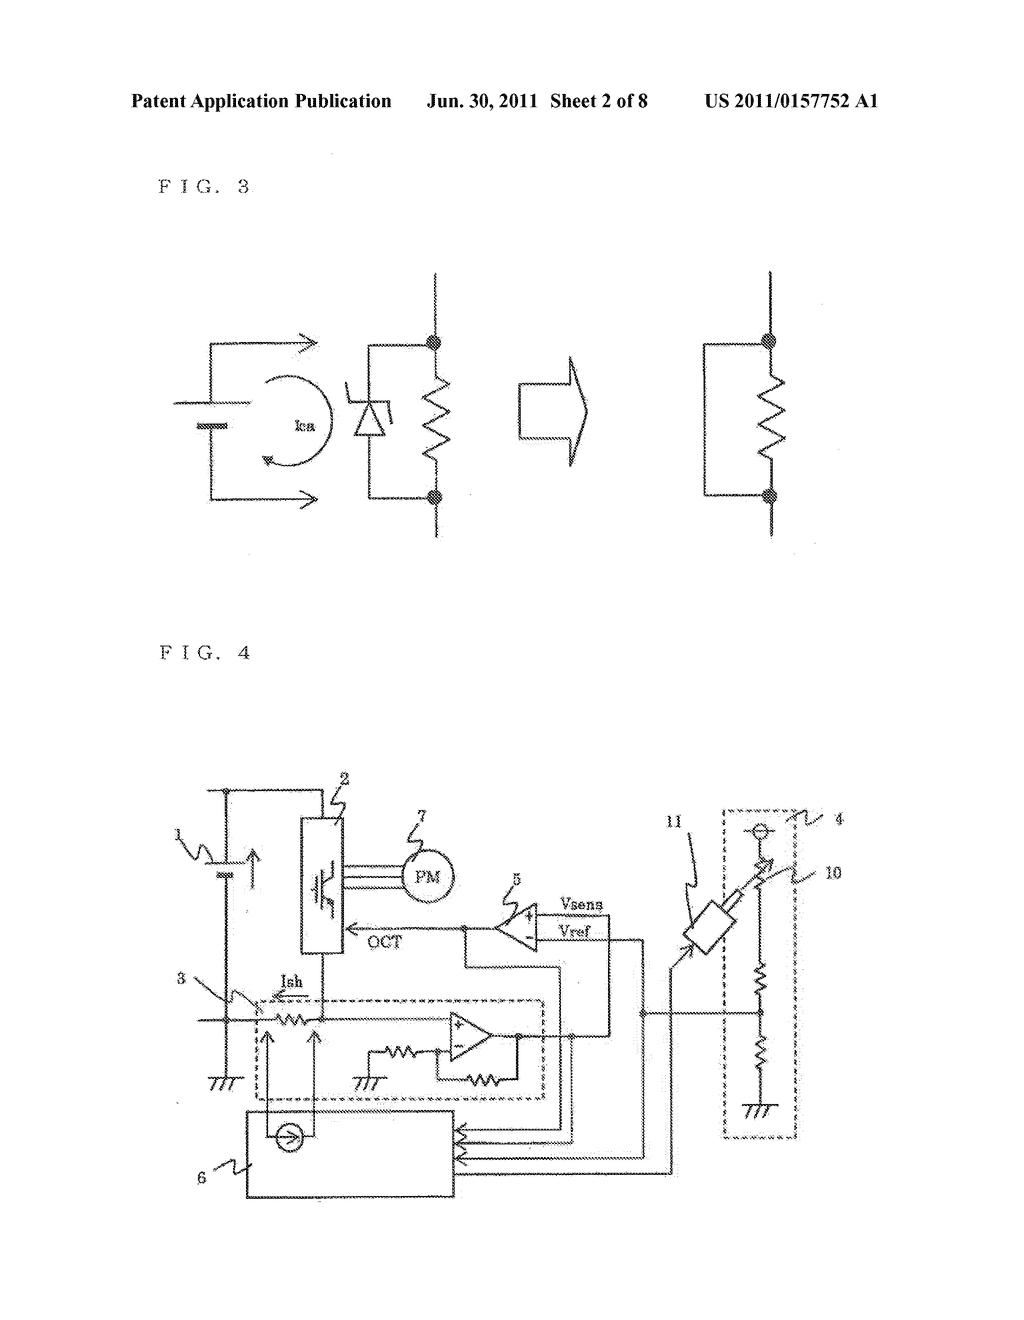 ram air compressor wiring diagram ram wiring diagrams ram air compressor wiring diagram jodebal com